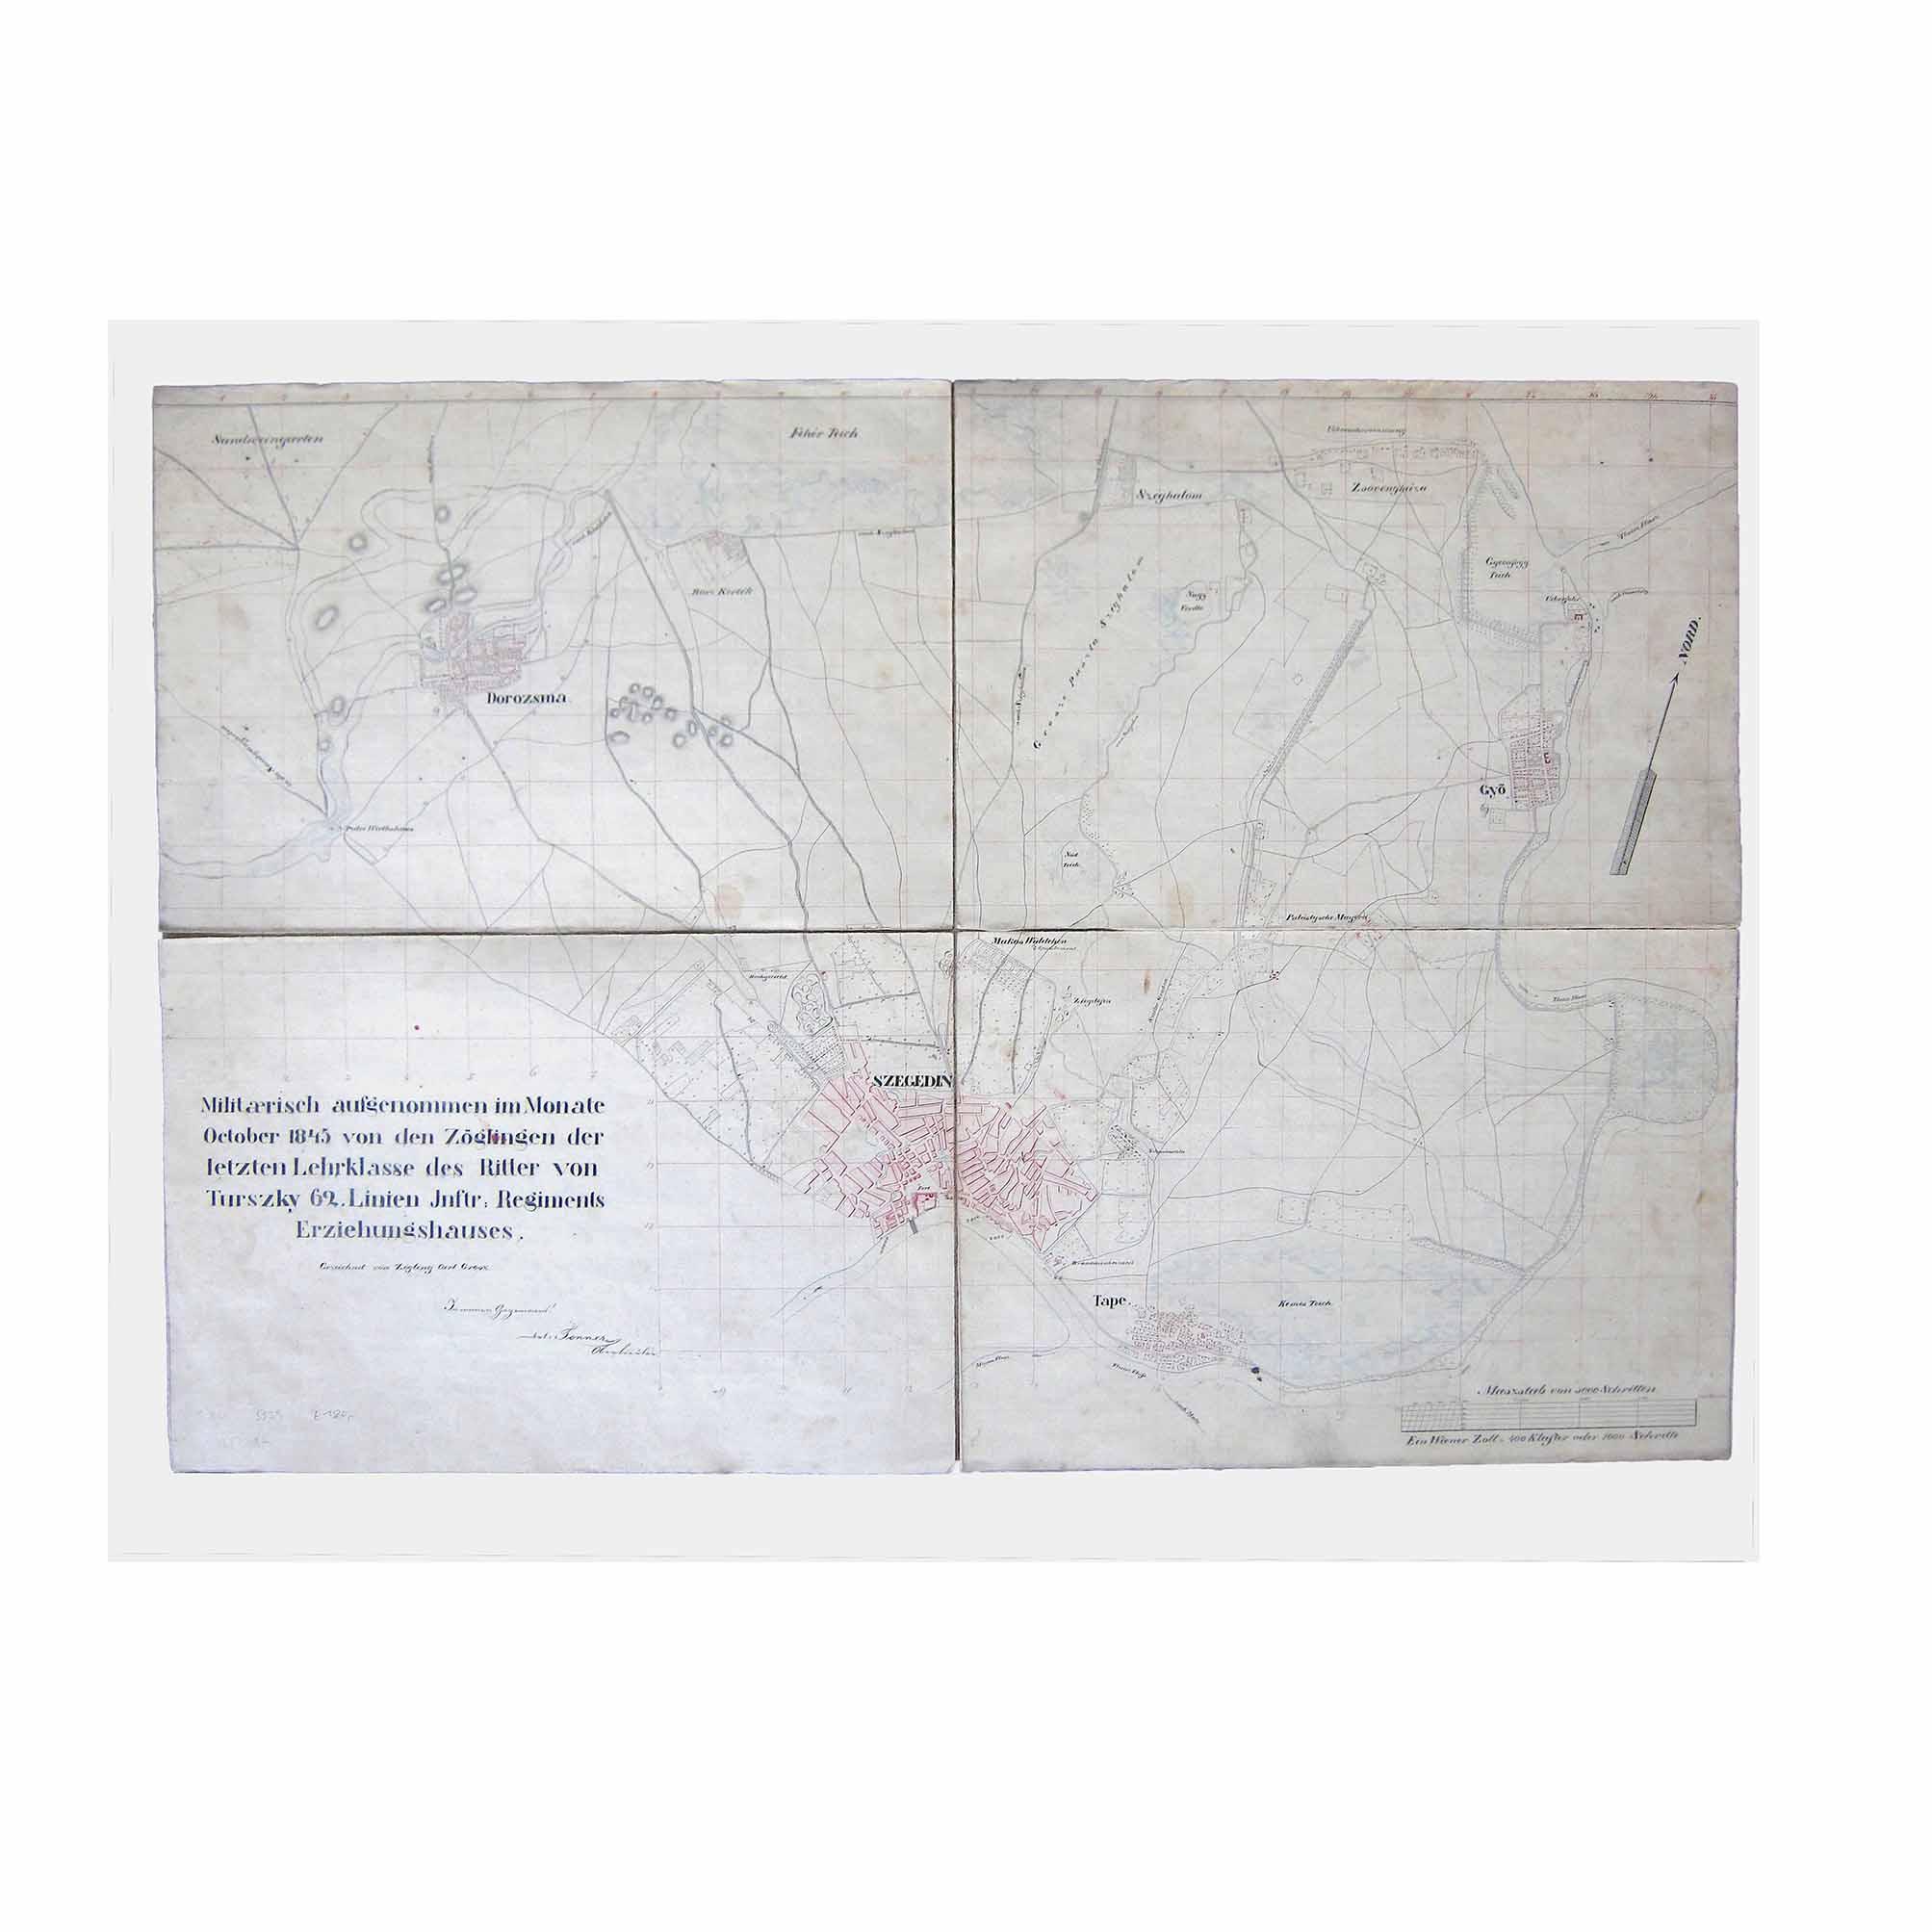 5539-Hs.-Karte-Szeged-1845-frei-N.jpg